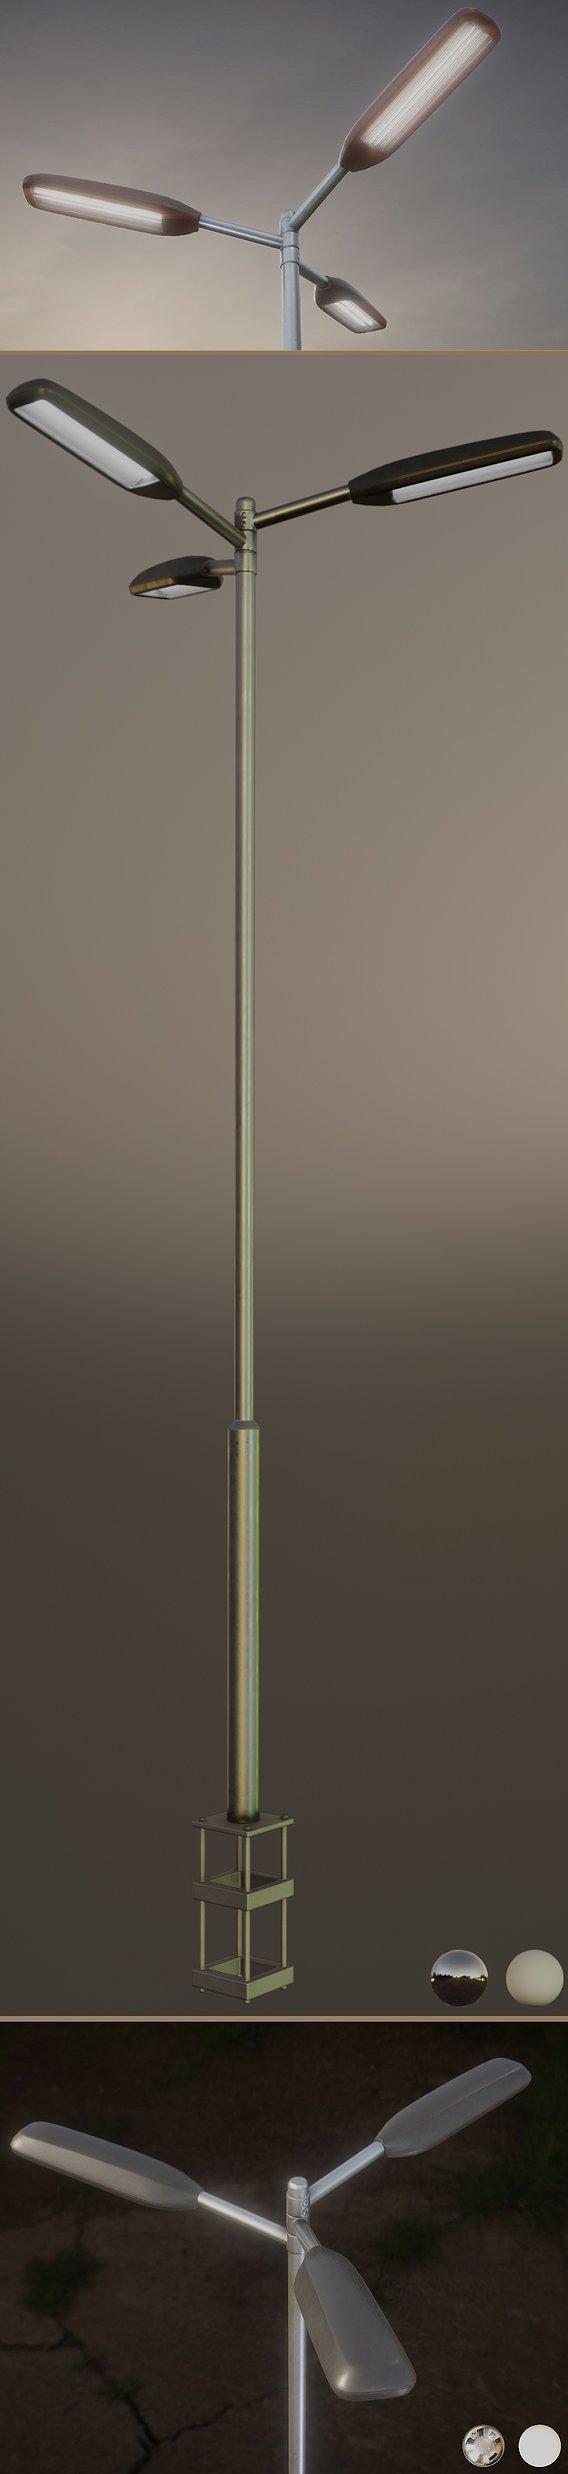 Street-Light 11 Pole-2 Version-5